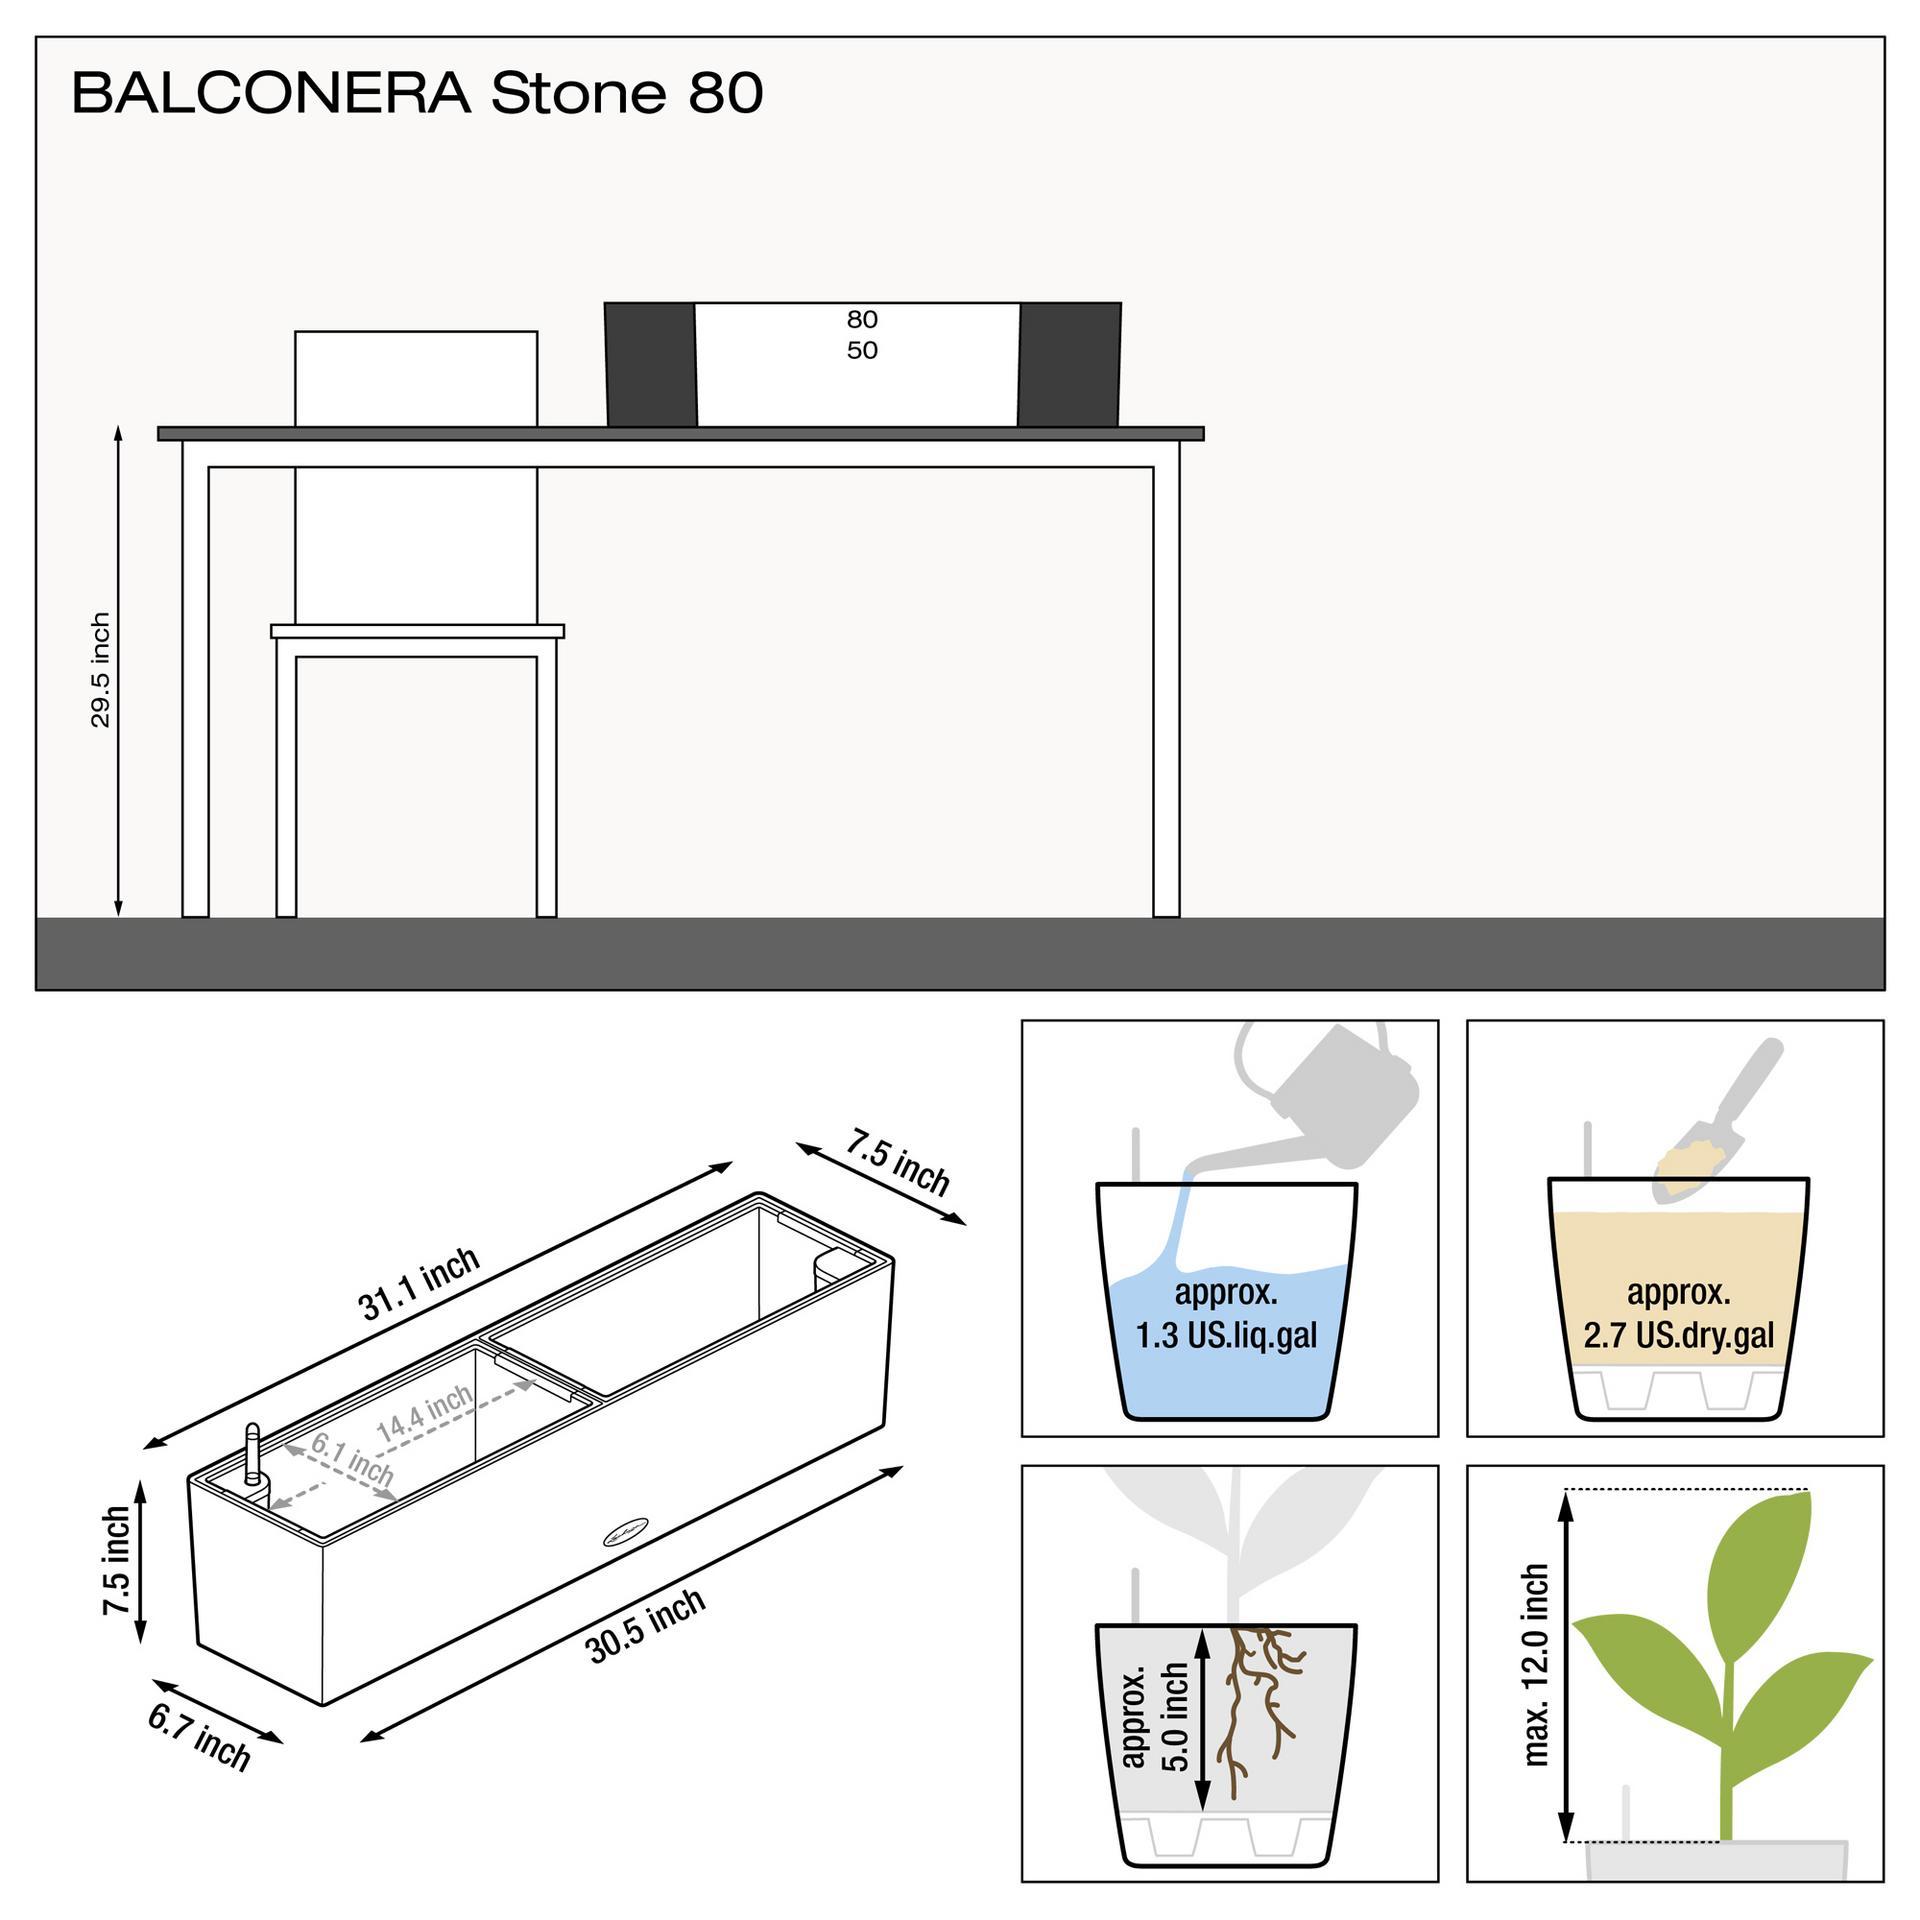 le_balconera-stone80_product_addi_nz_us